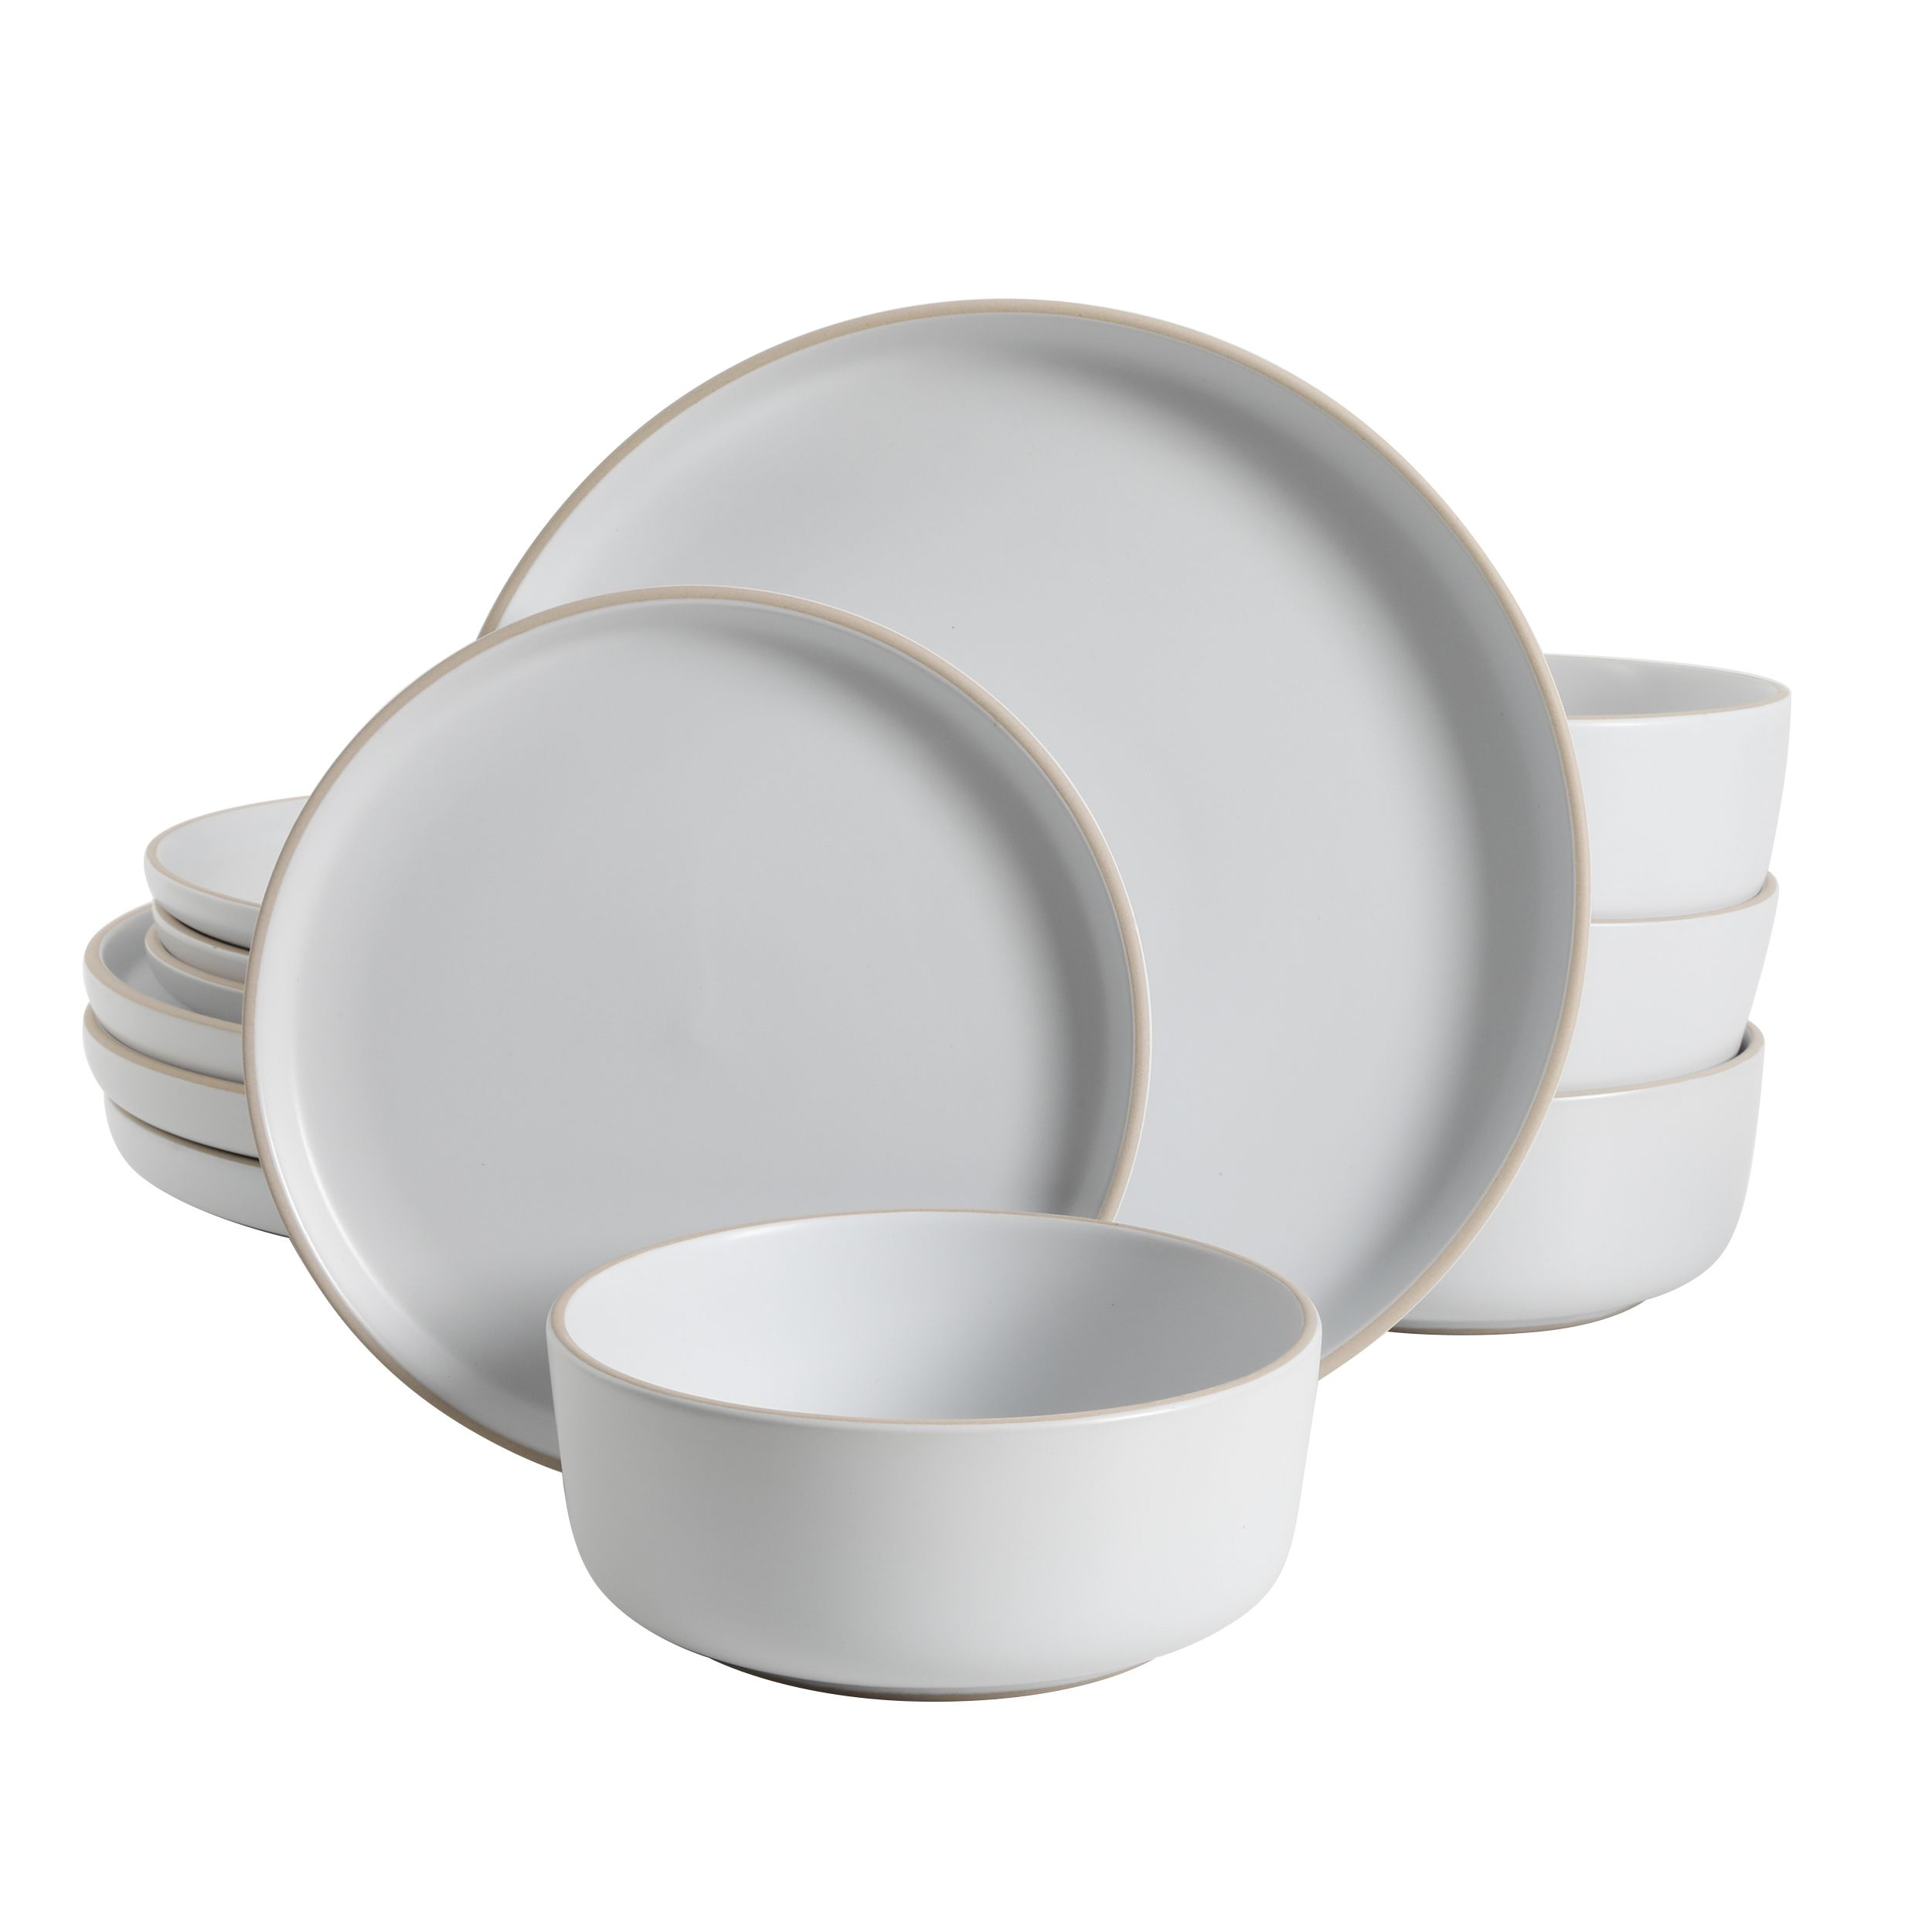 Gourmet Art 12 Piece Beaded Chateau Melamine Dinnerware Set White Service For 4 Includes Dinner Plates Salad Plates And Bowls Walmart Com Melamine Dinnerware Sets Farmhouse Dinnerware Melamine Dinnerware